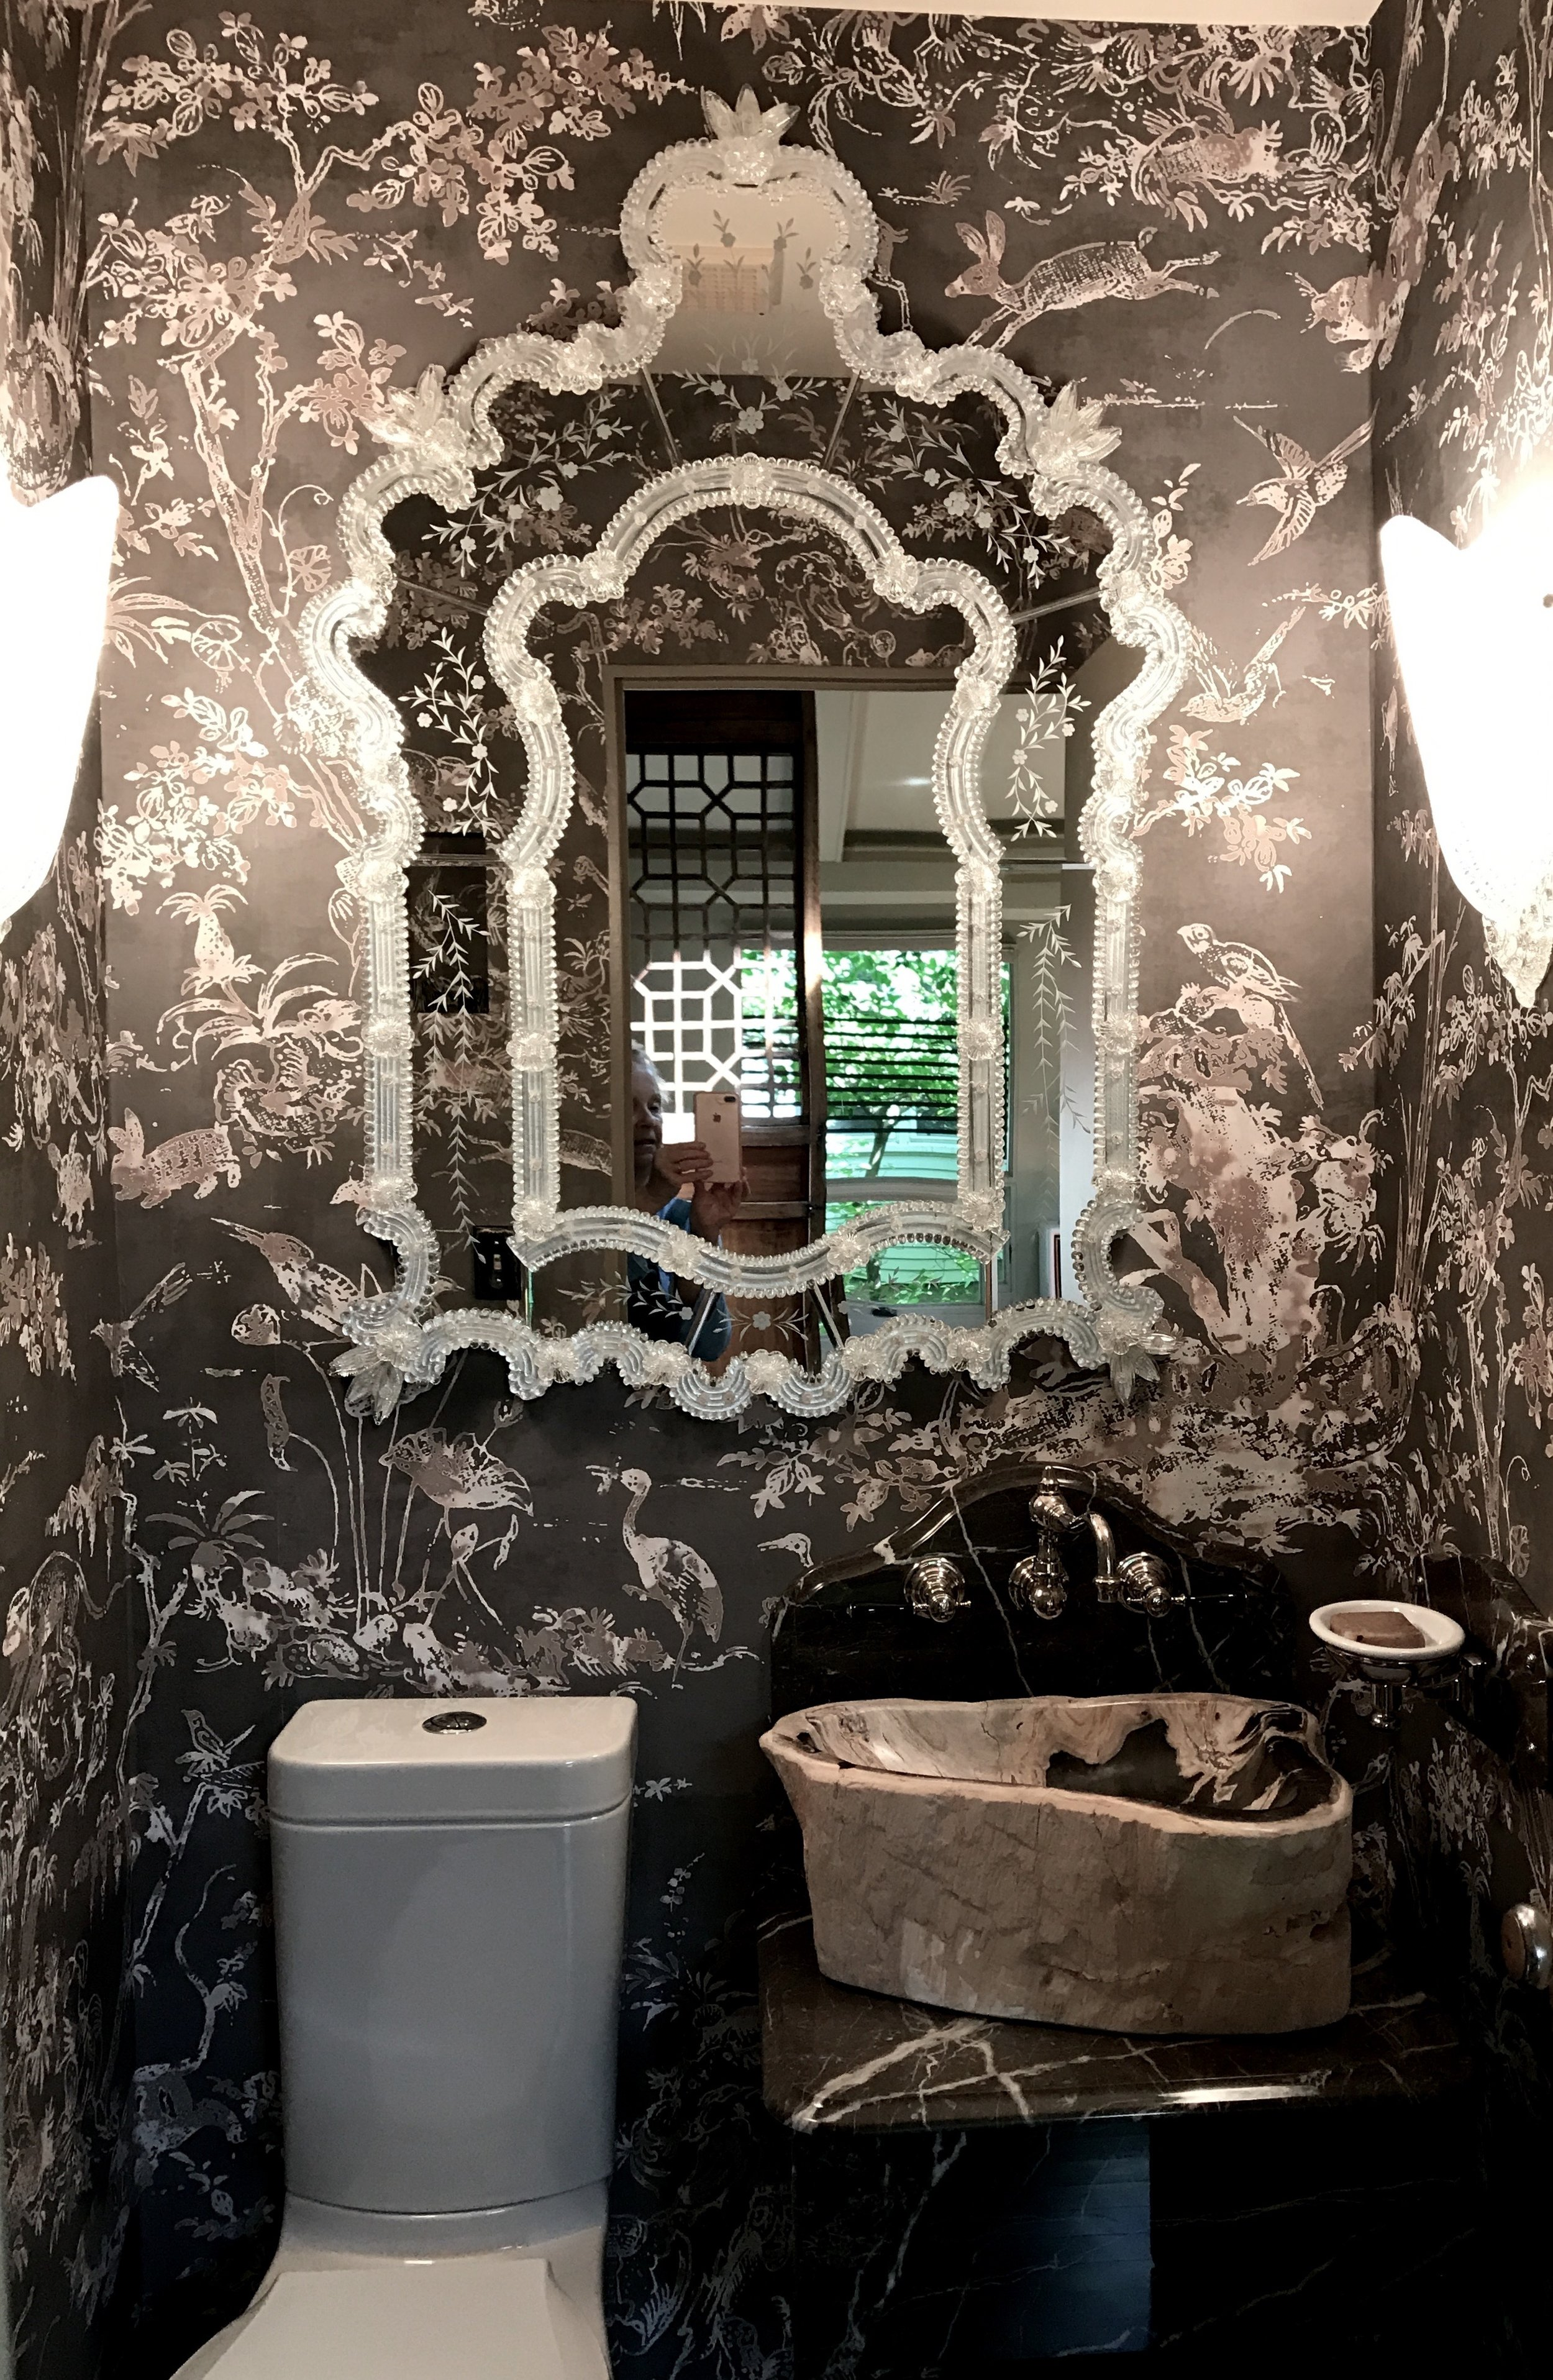 Photo Salon Feng Shui interior enviornments — jackie patricia